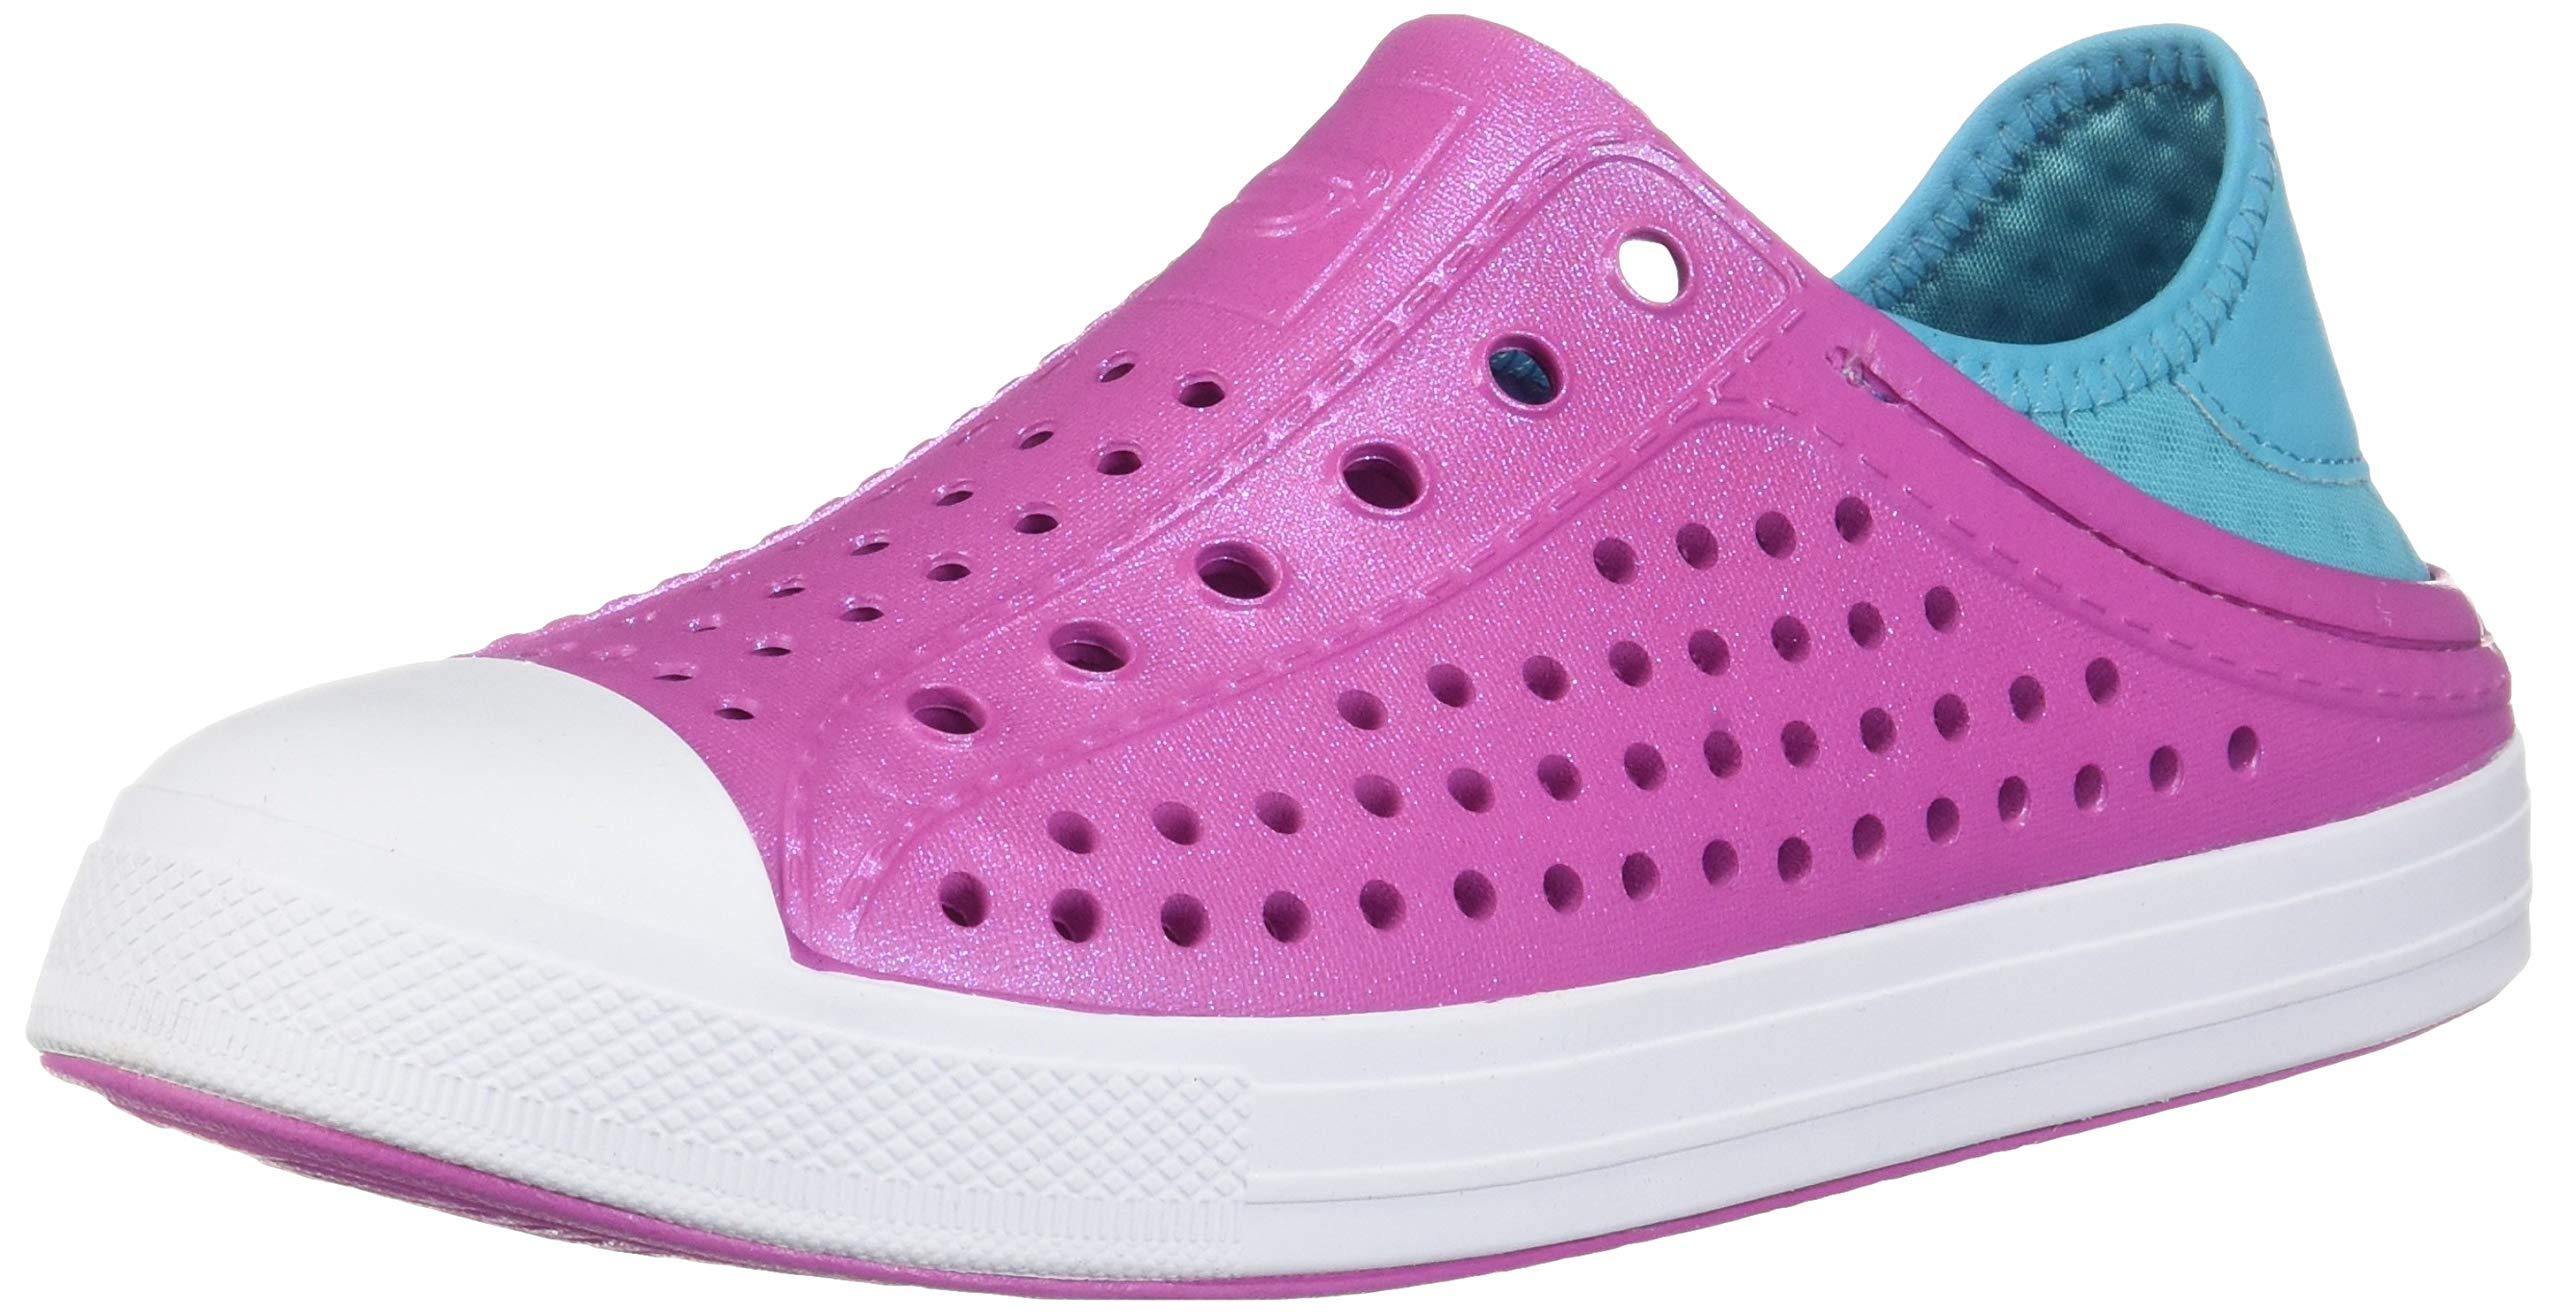 Skechers Girl's, Guzman Steps Slip on Shoes Pink 4 M